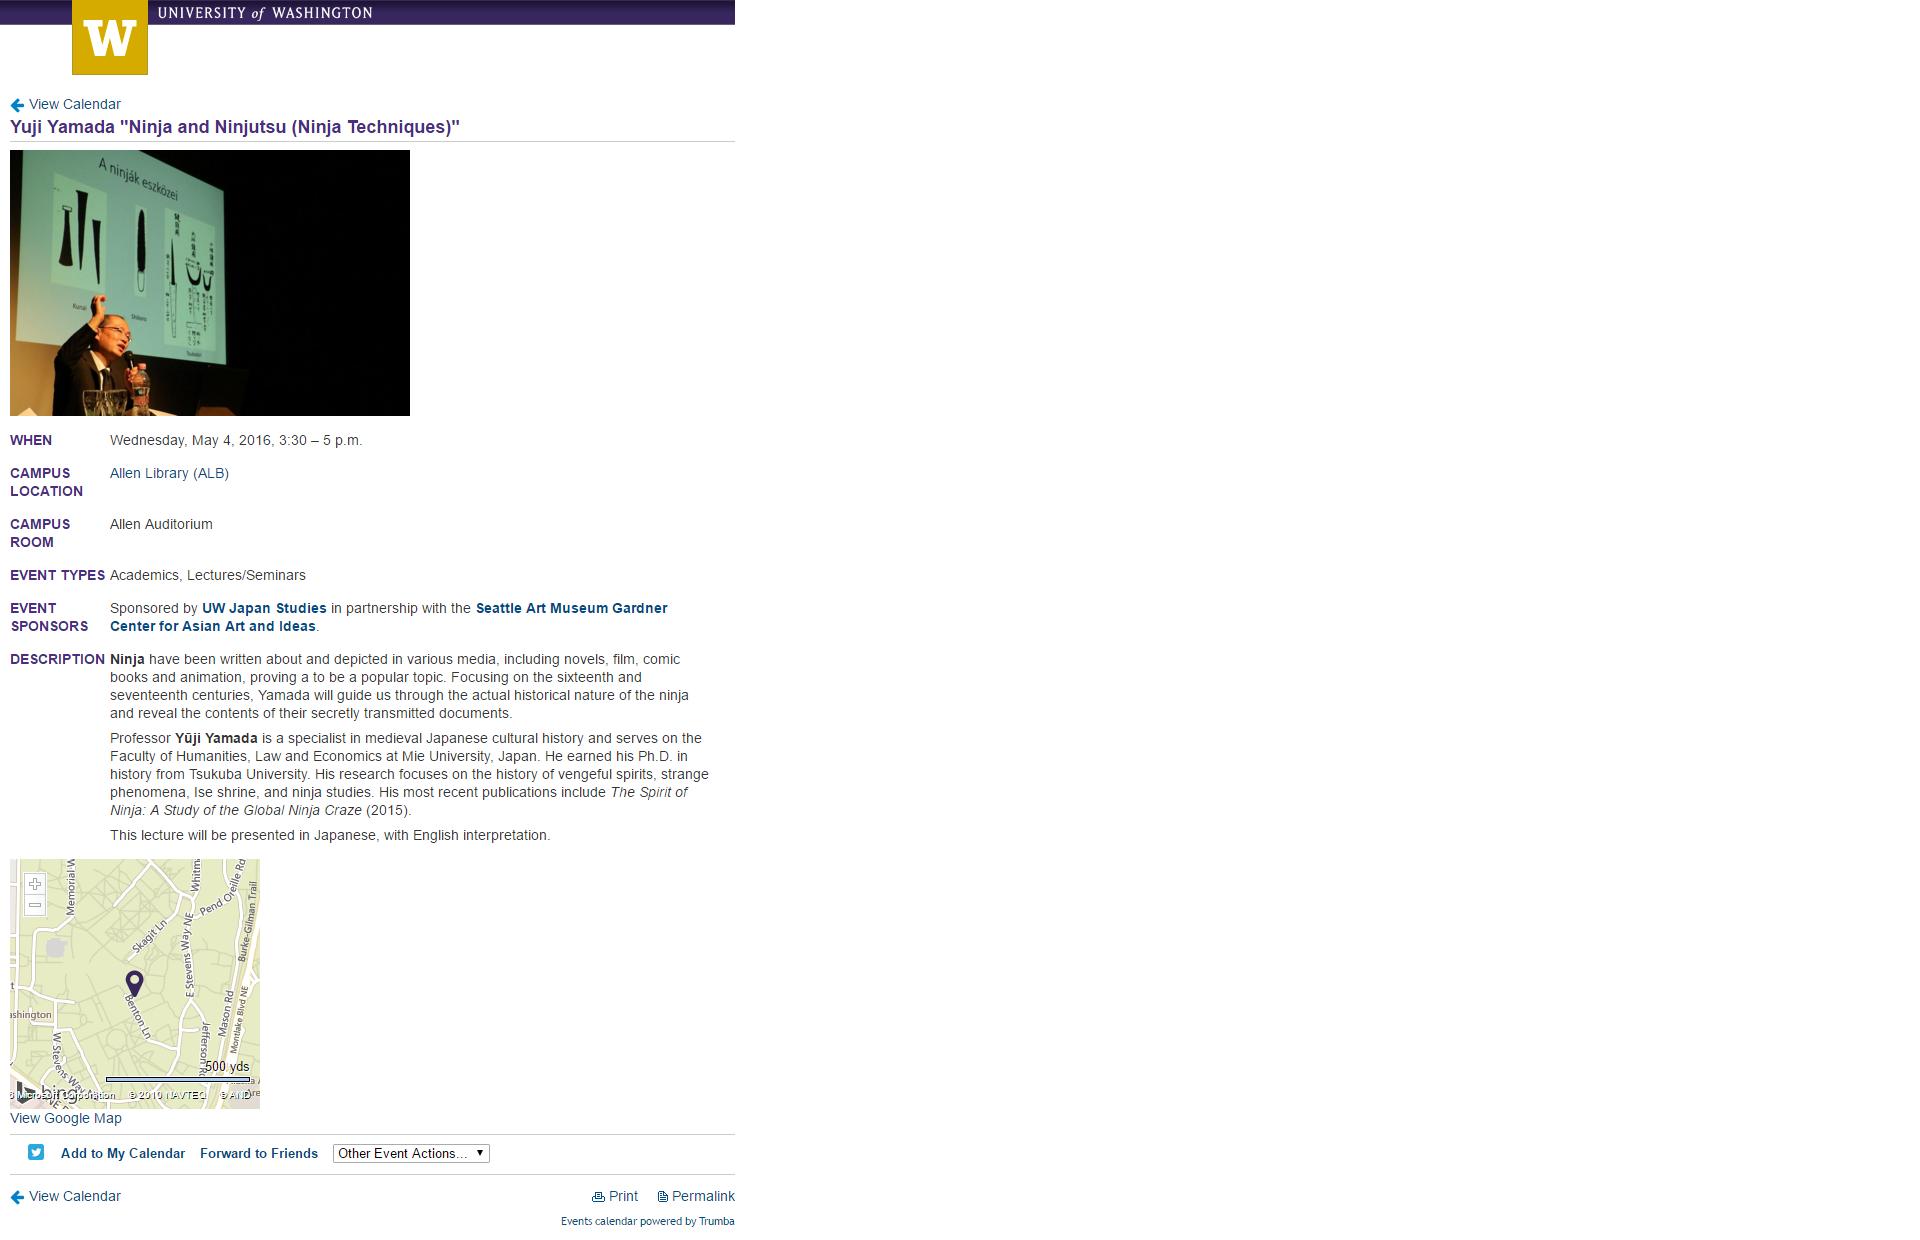 screencapture-calendar-washington-edu-sea_uwch-117978776-YujiYamadaNinjaandNinjutsuNinjaTechniques-1461820055664.png